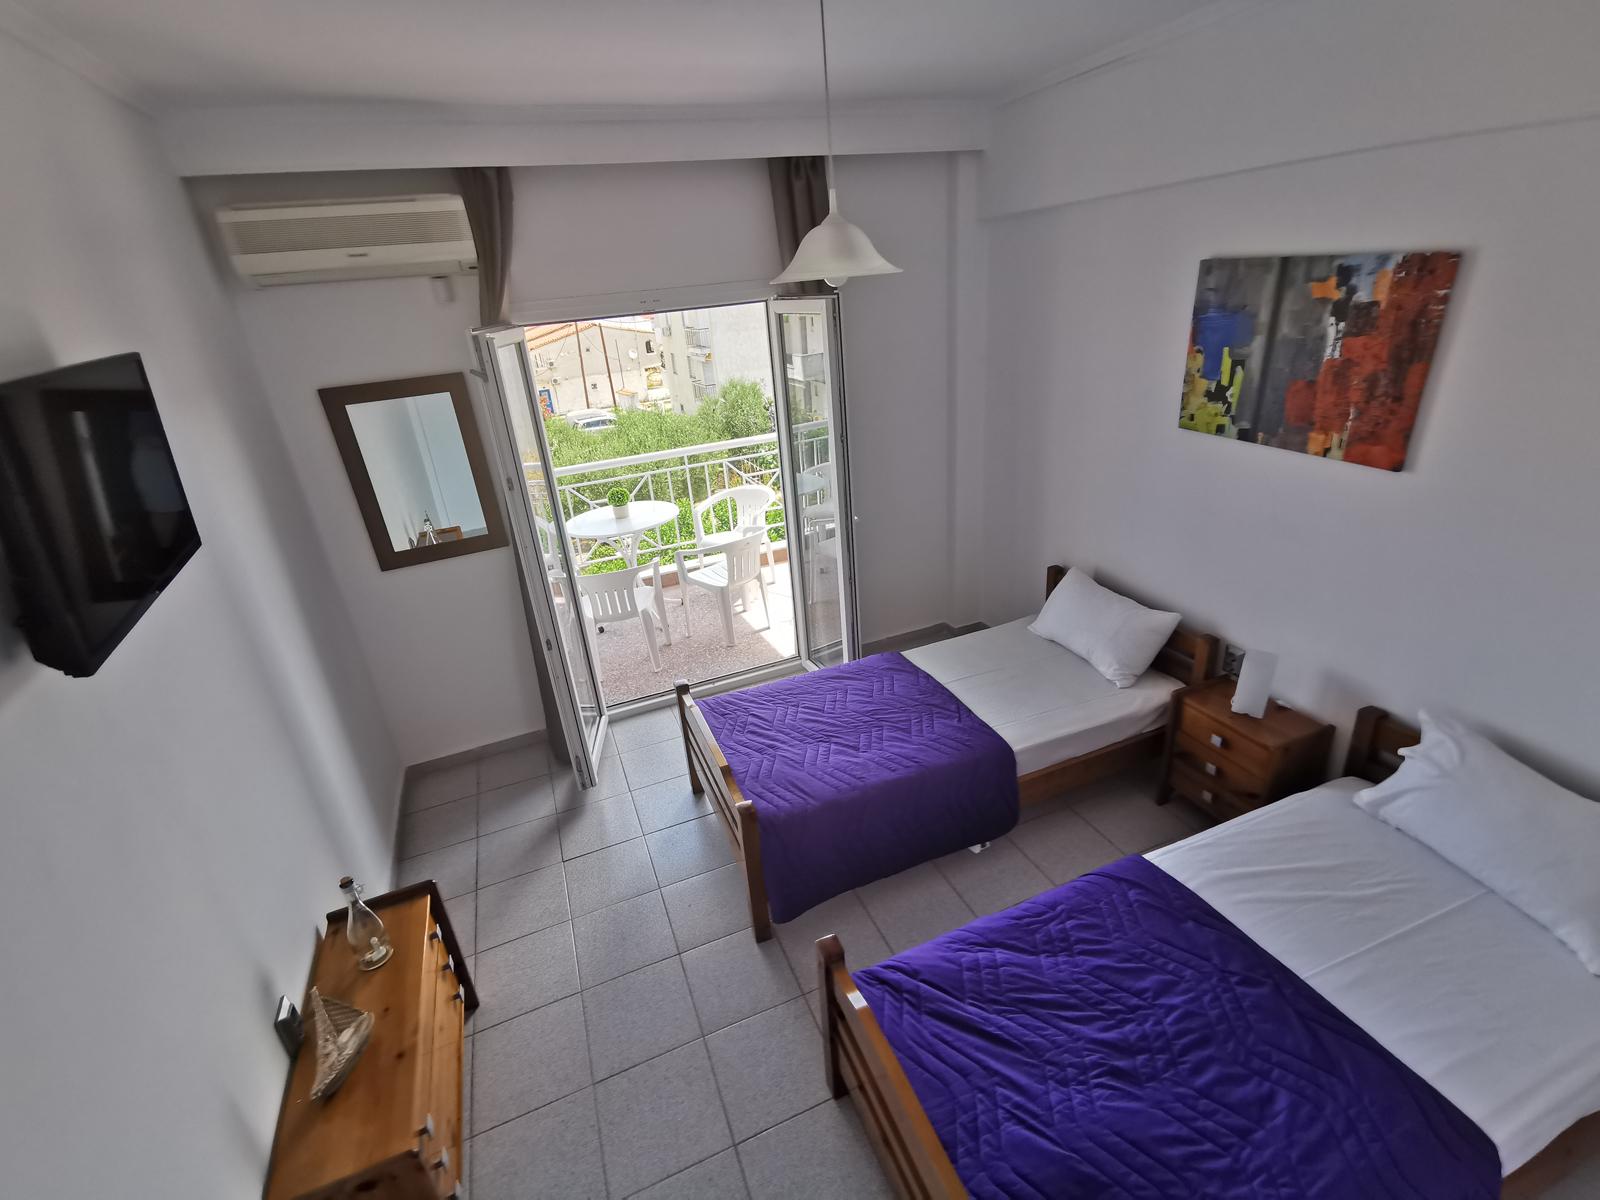 Grcka apartmani letovanje, Polihrono Halkidiki, Green Gardens,spavaća soba